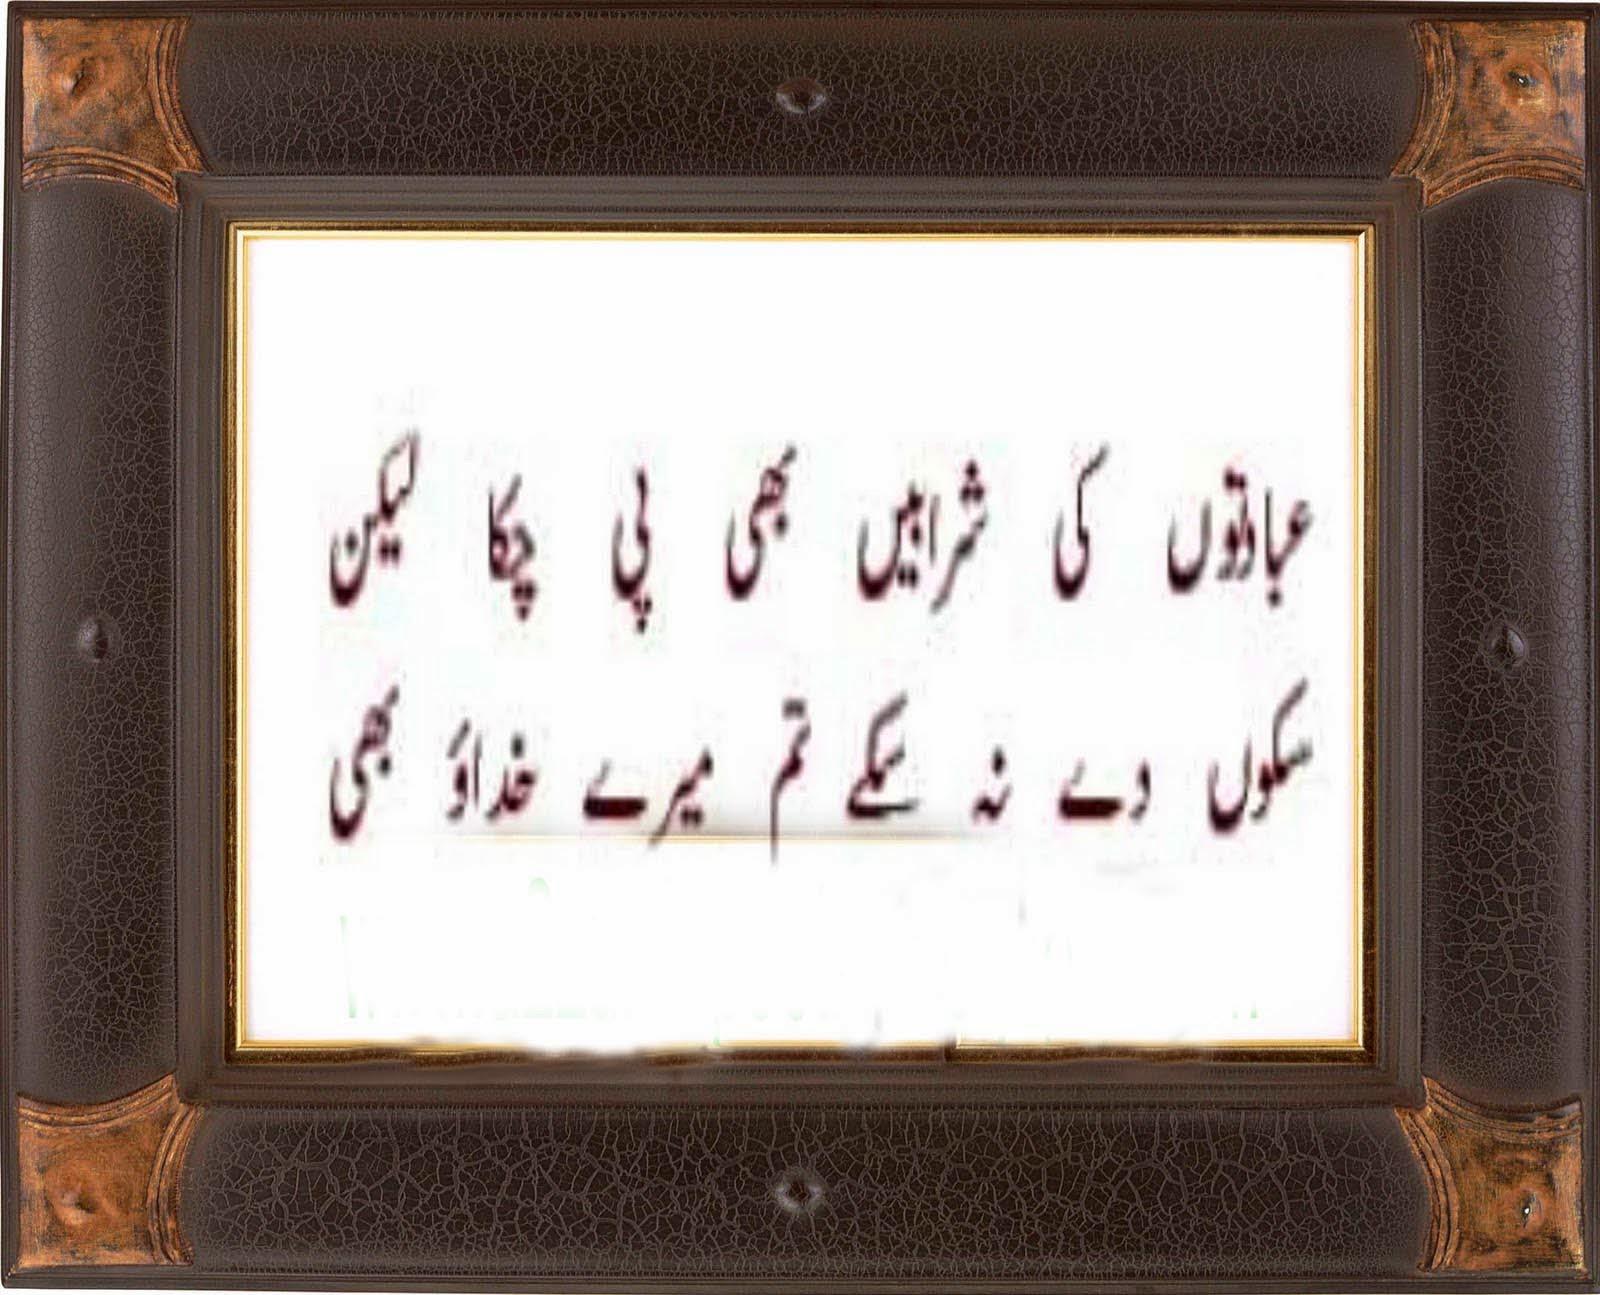 Sharab SMS Shayari In Urdu